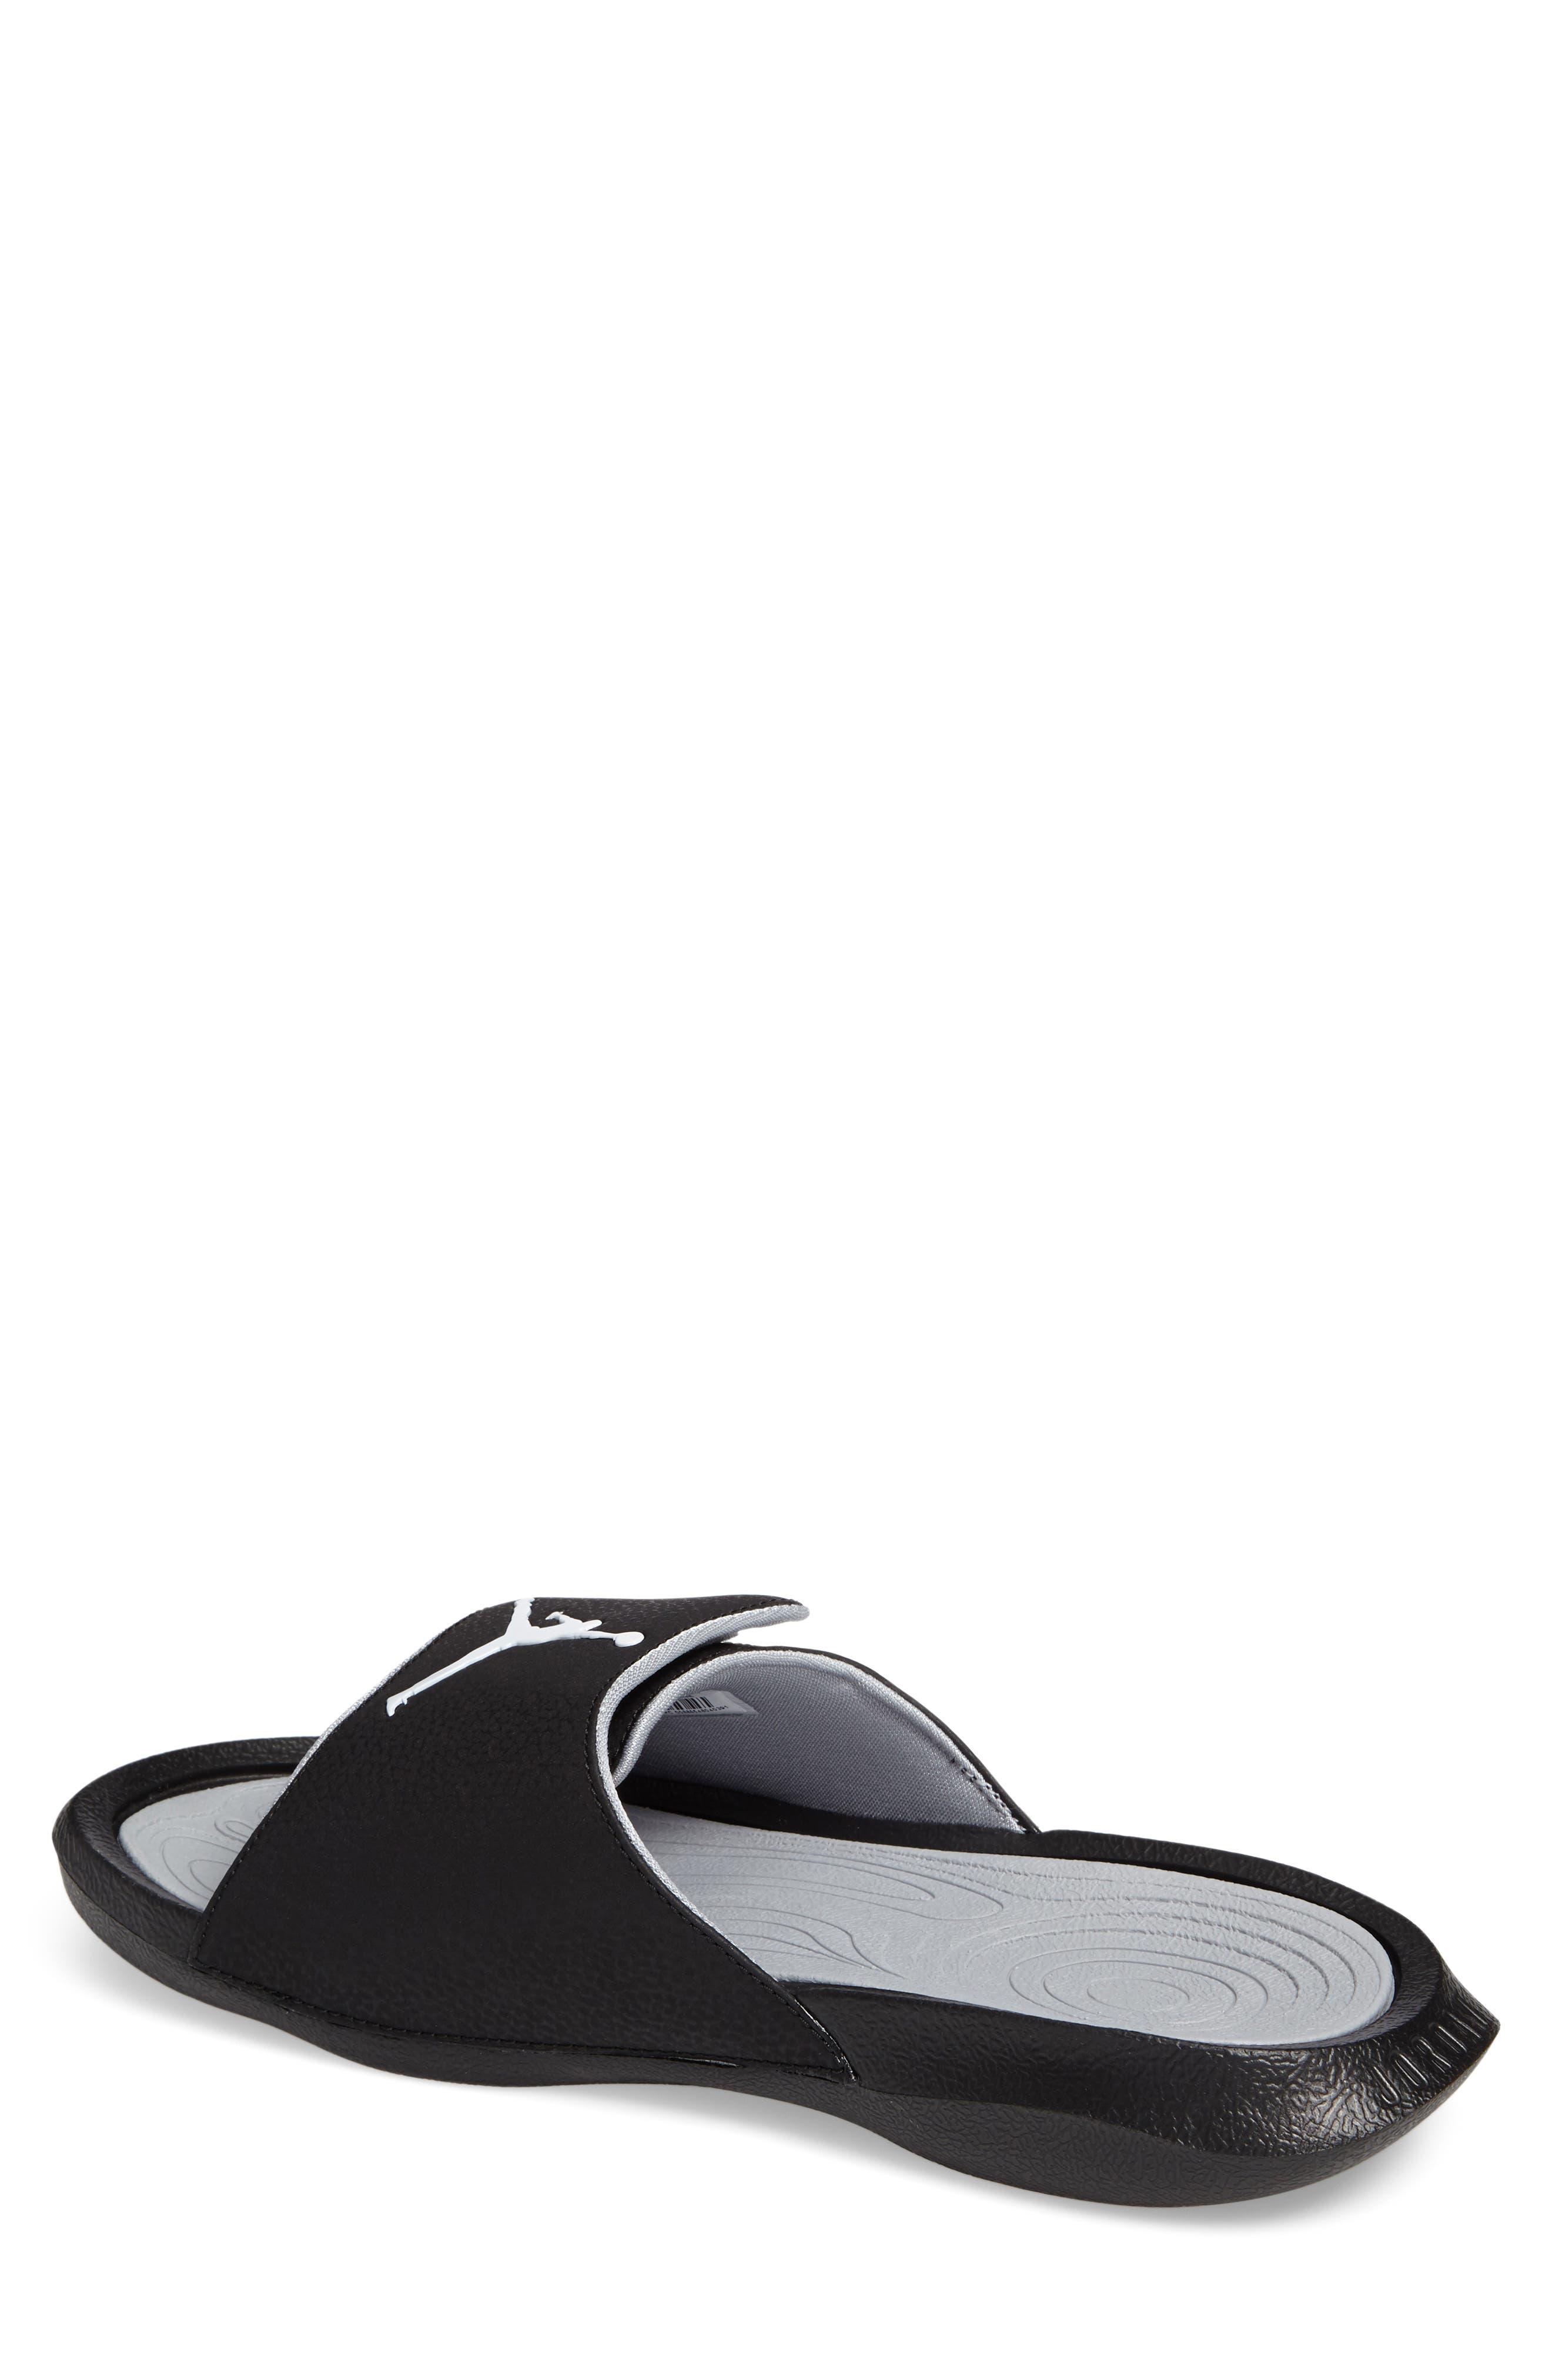 NIKE,                             Jordan Hydro 6 Slide Sandal,                             Alternate thumbnail 2, color,                             011